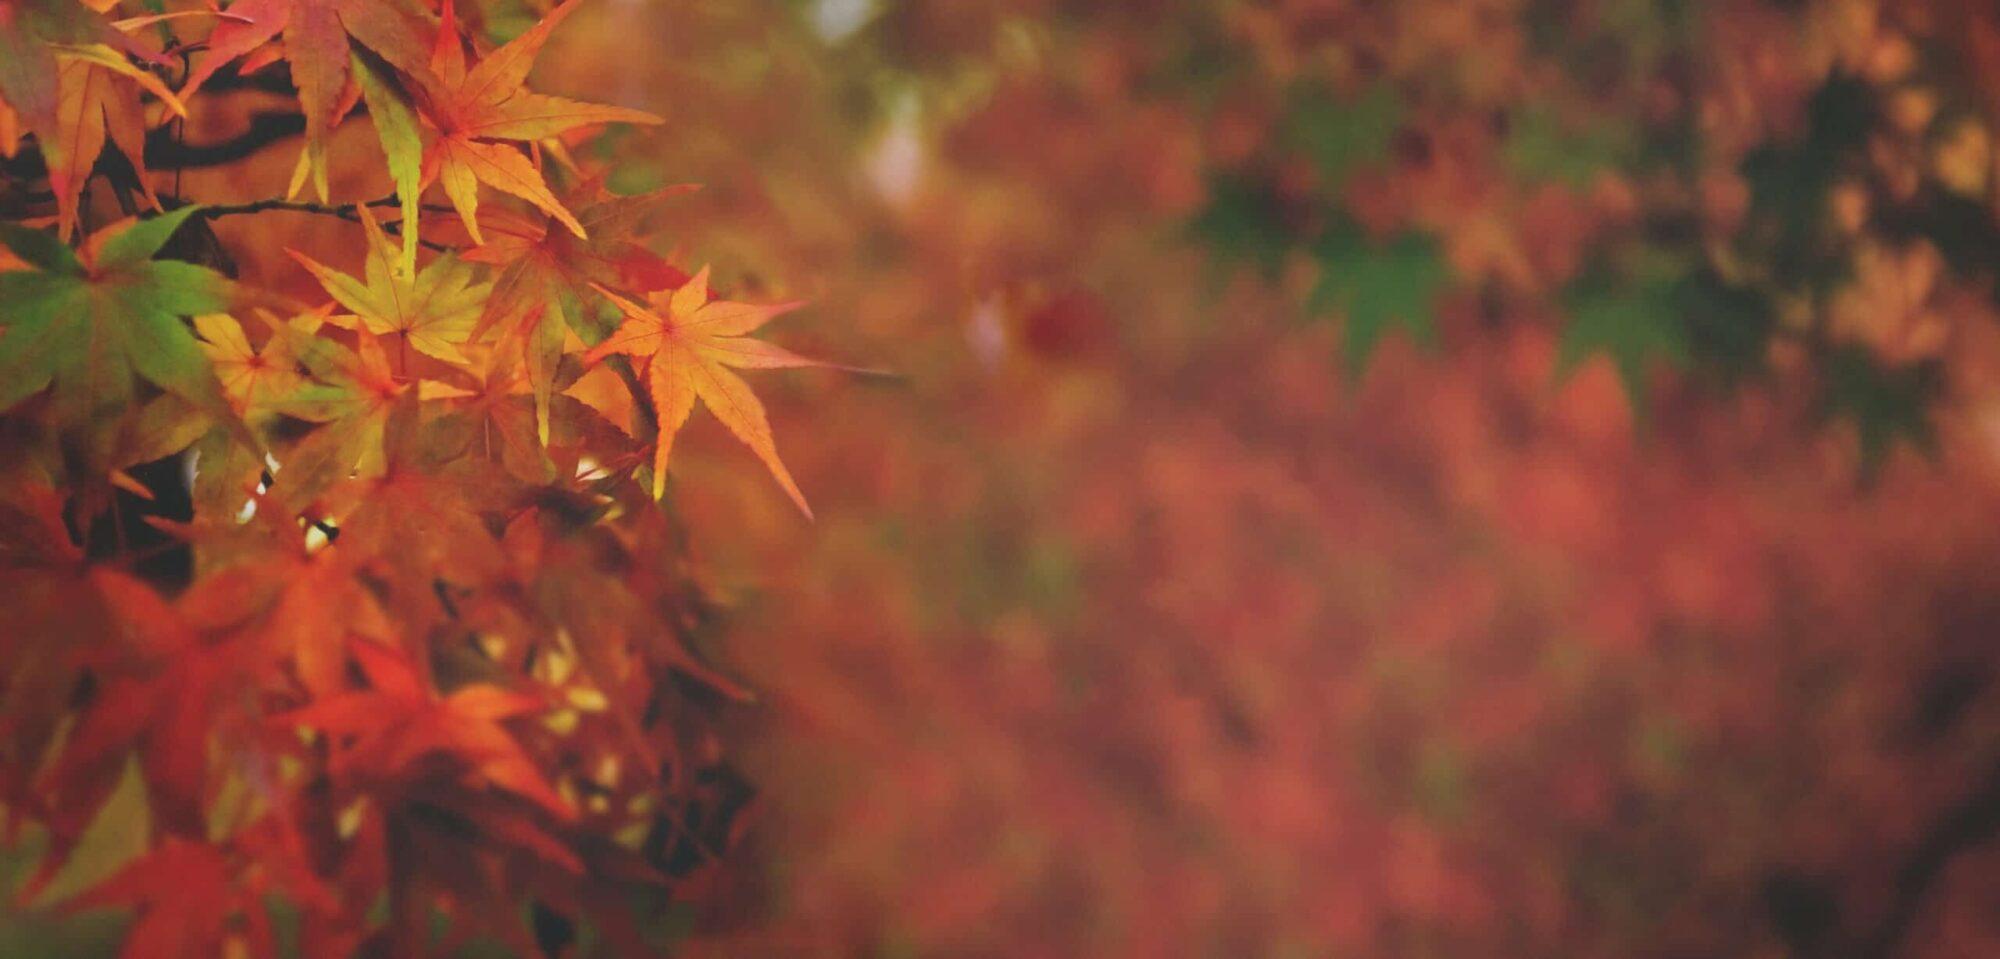 EMLF to hold Fall Symposium October 12-14